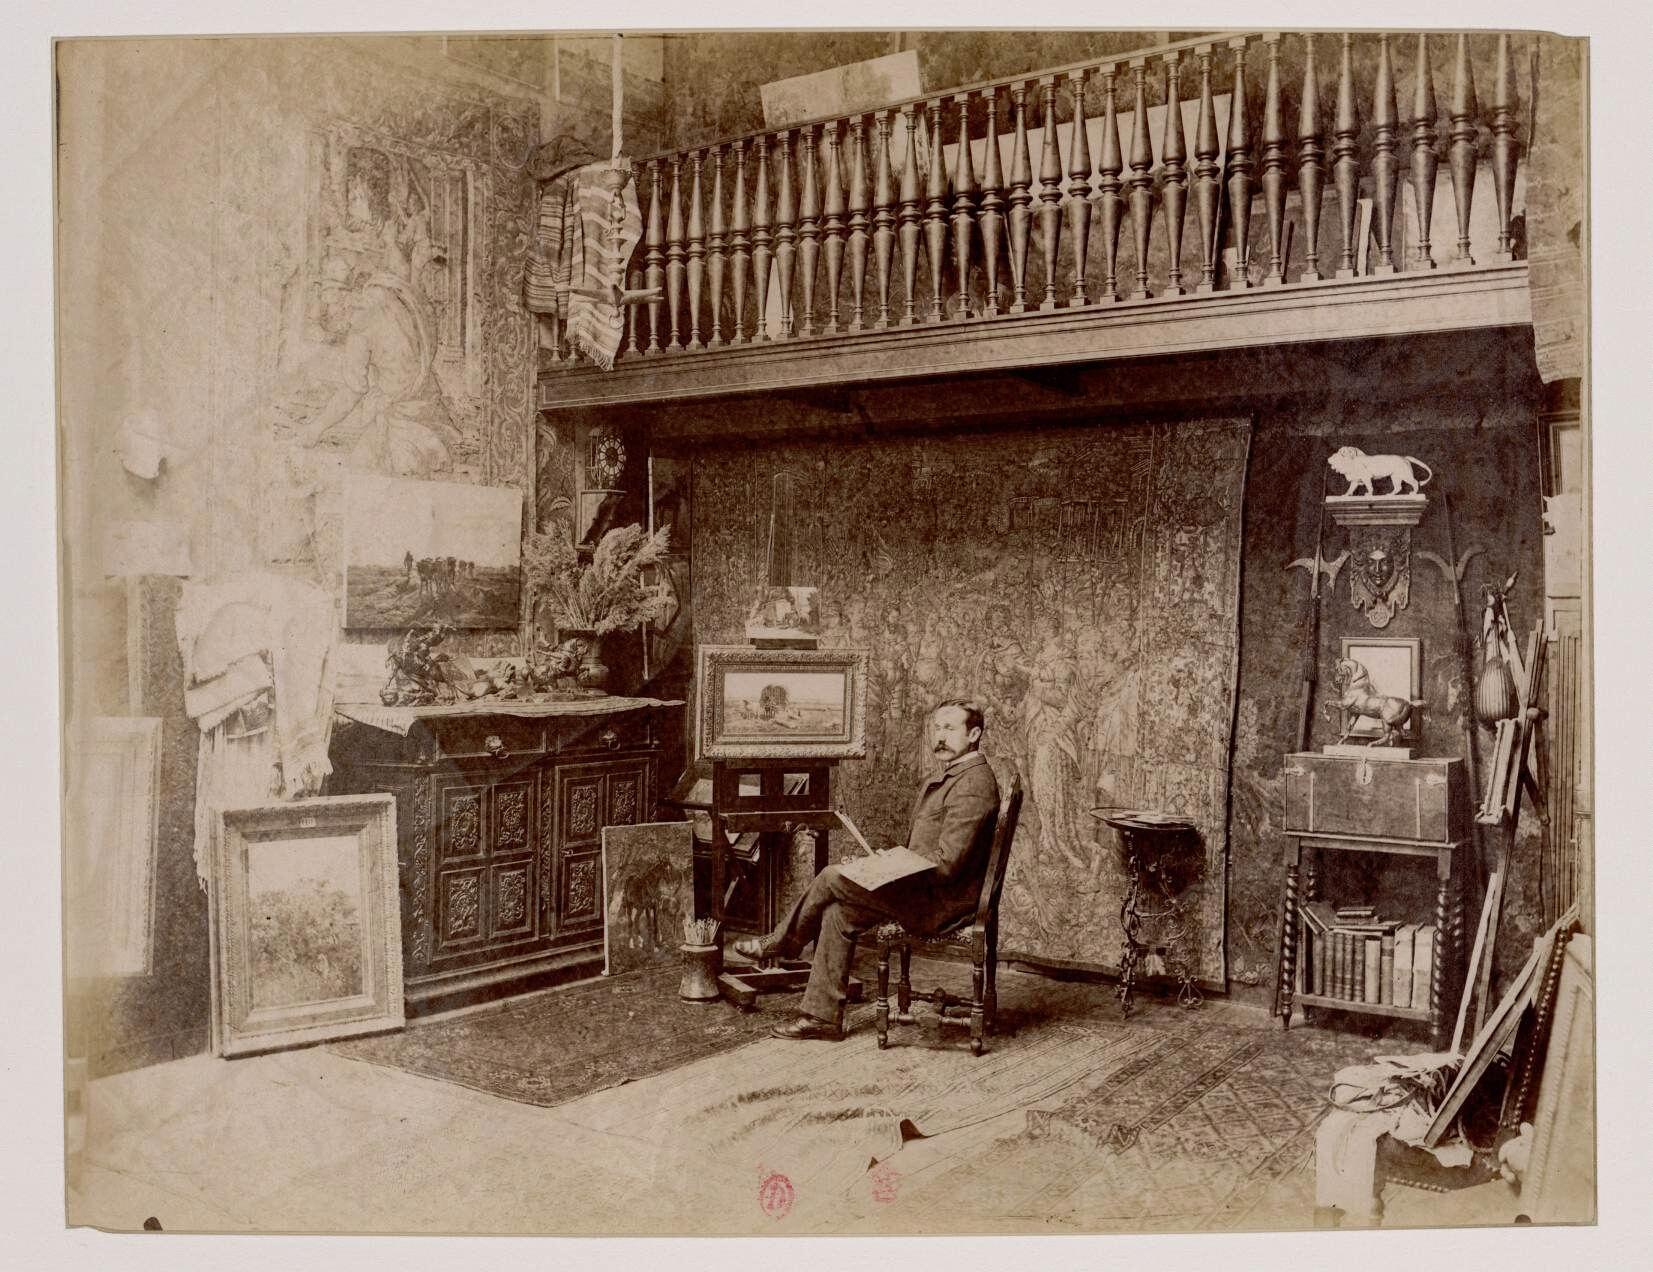 Альфред Элиас (работал в 1881-1911) (живописец)